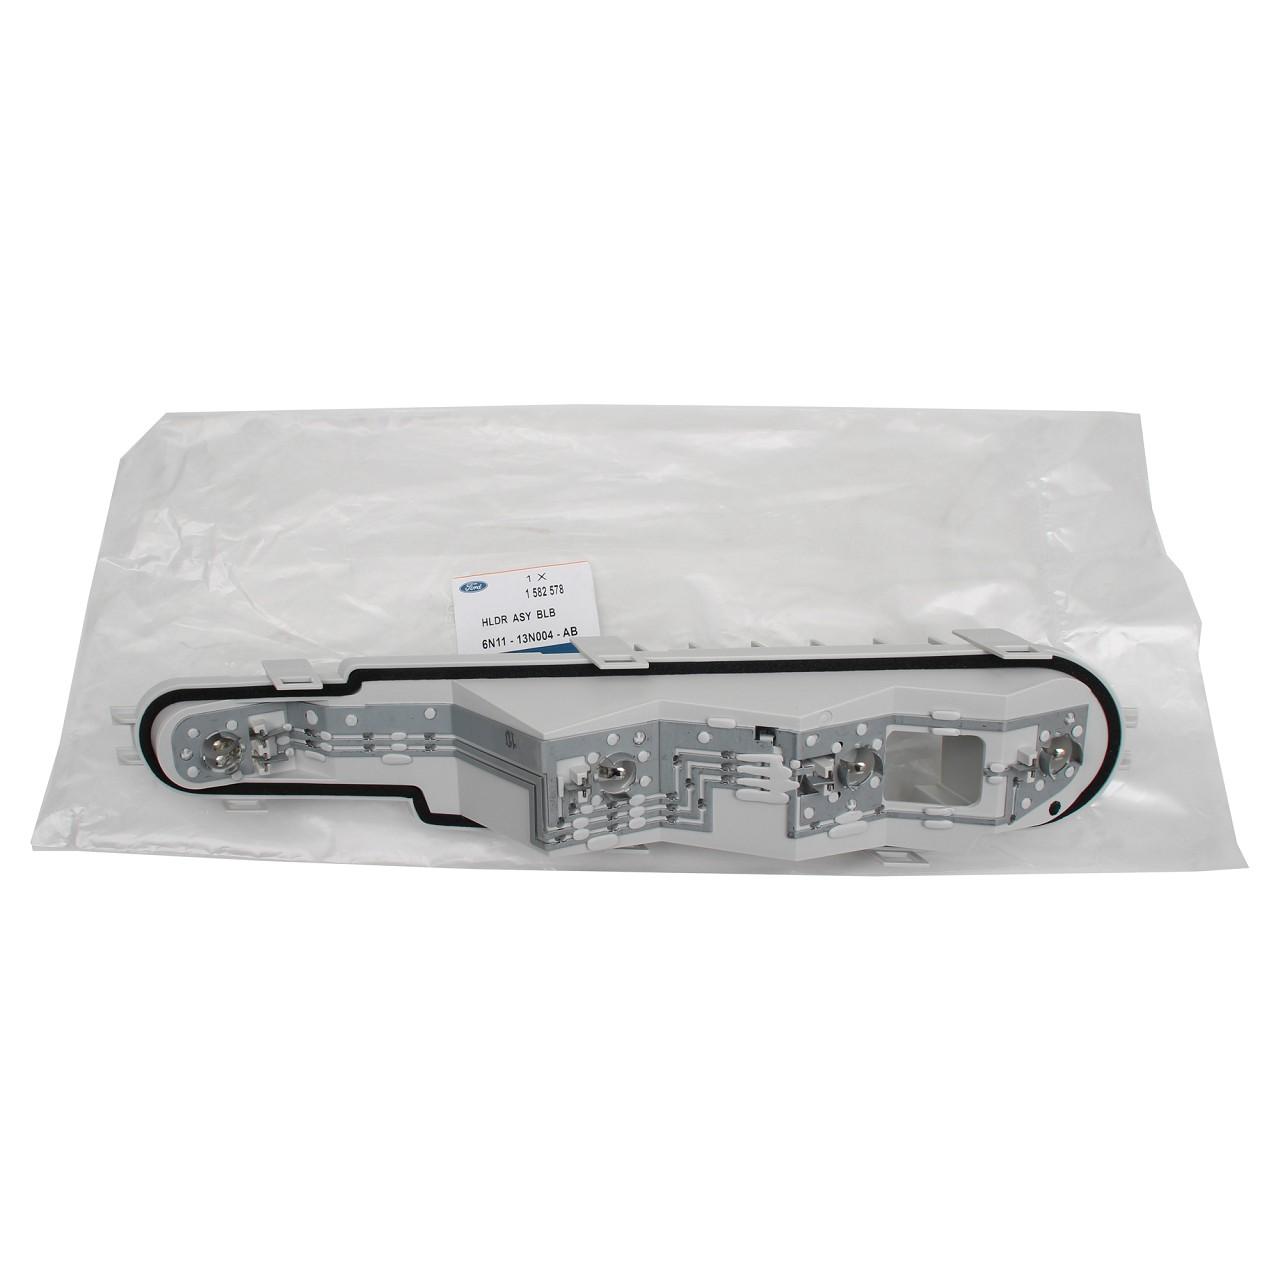 ORIGINAL Ford Lampenfassung Blinkleuchte Blinker FUSION hinten rechts 1582578